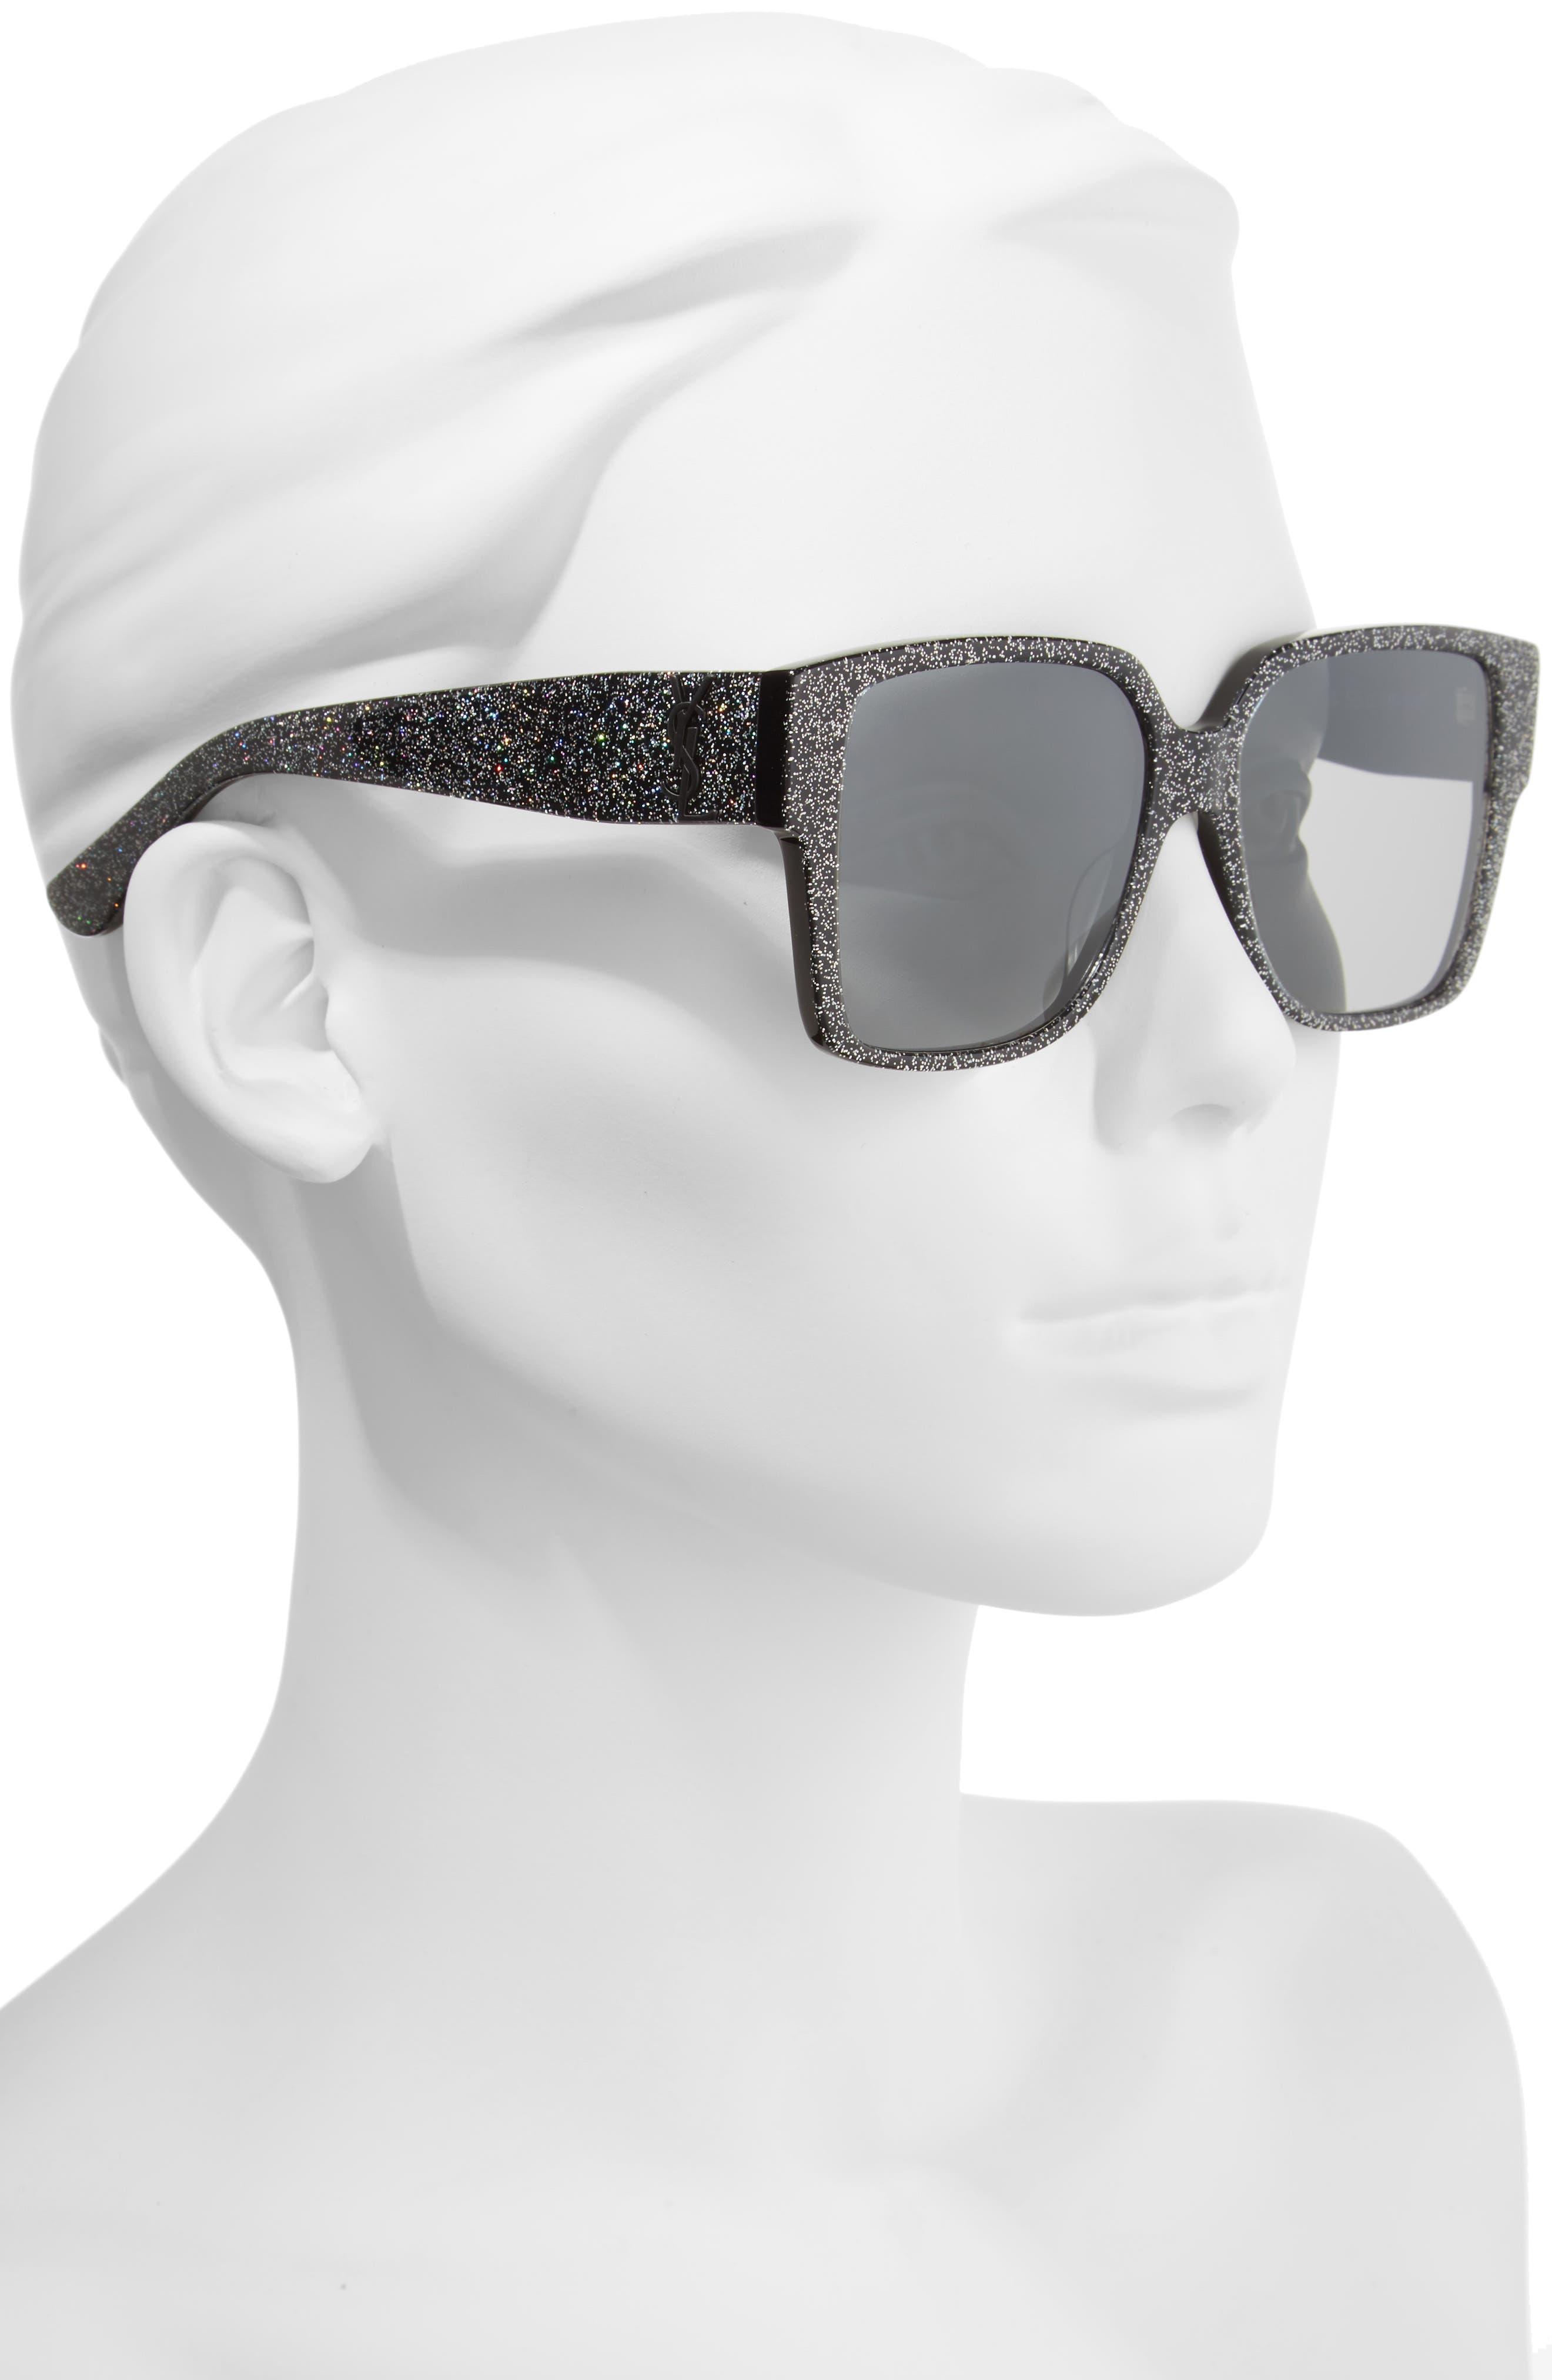 SAINT LAURENT, 55mm Square Sunglasses, Alternate thumbnail 2, color, MULTI/ SILVER